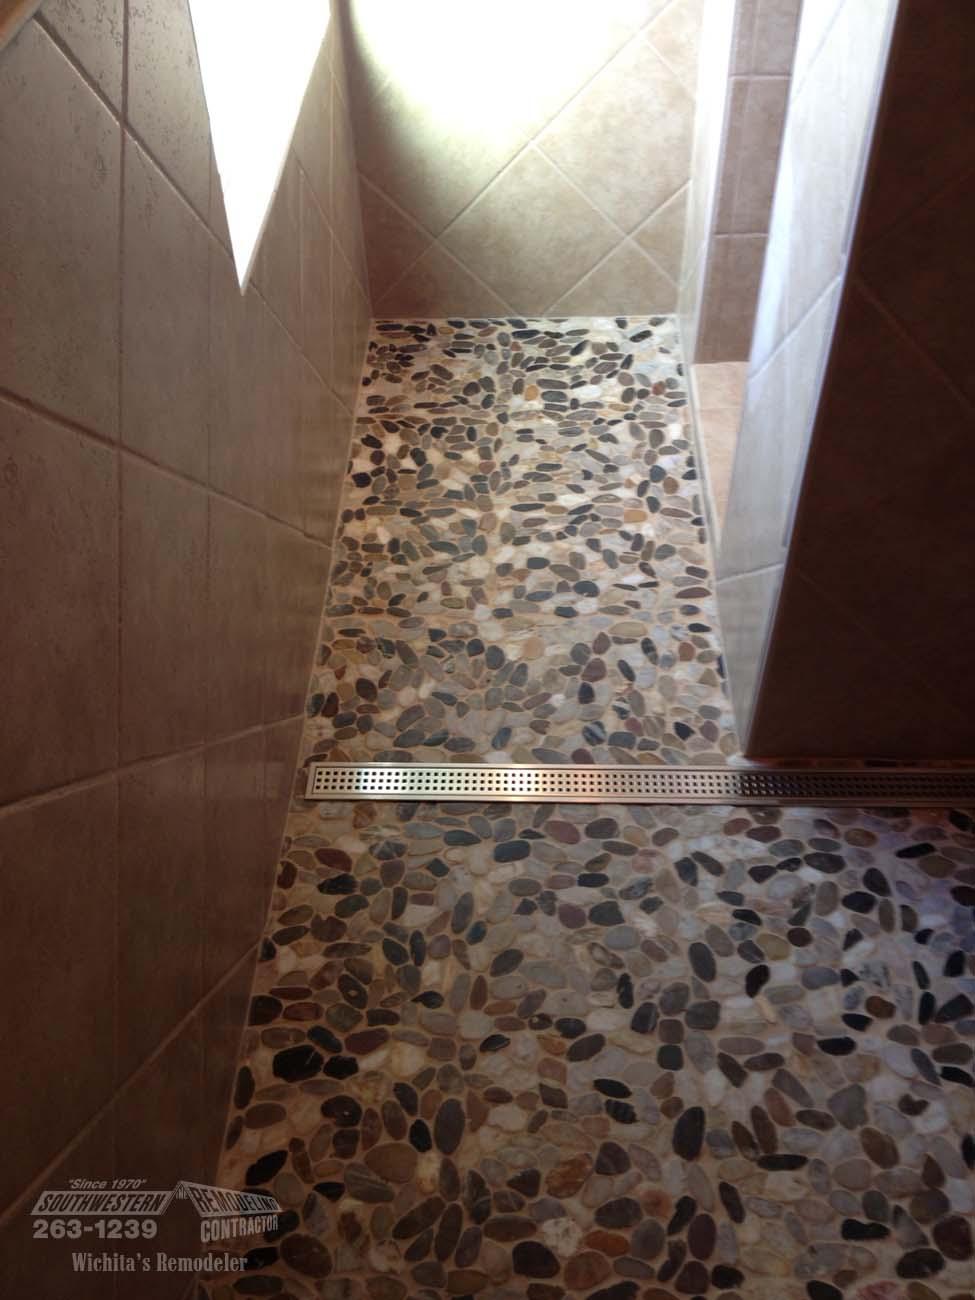 bathroom remodeling wichita ks. 22 · Bathroom Remodeling Wichita Home Remodeler Ks